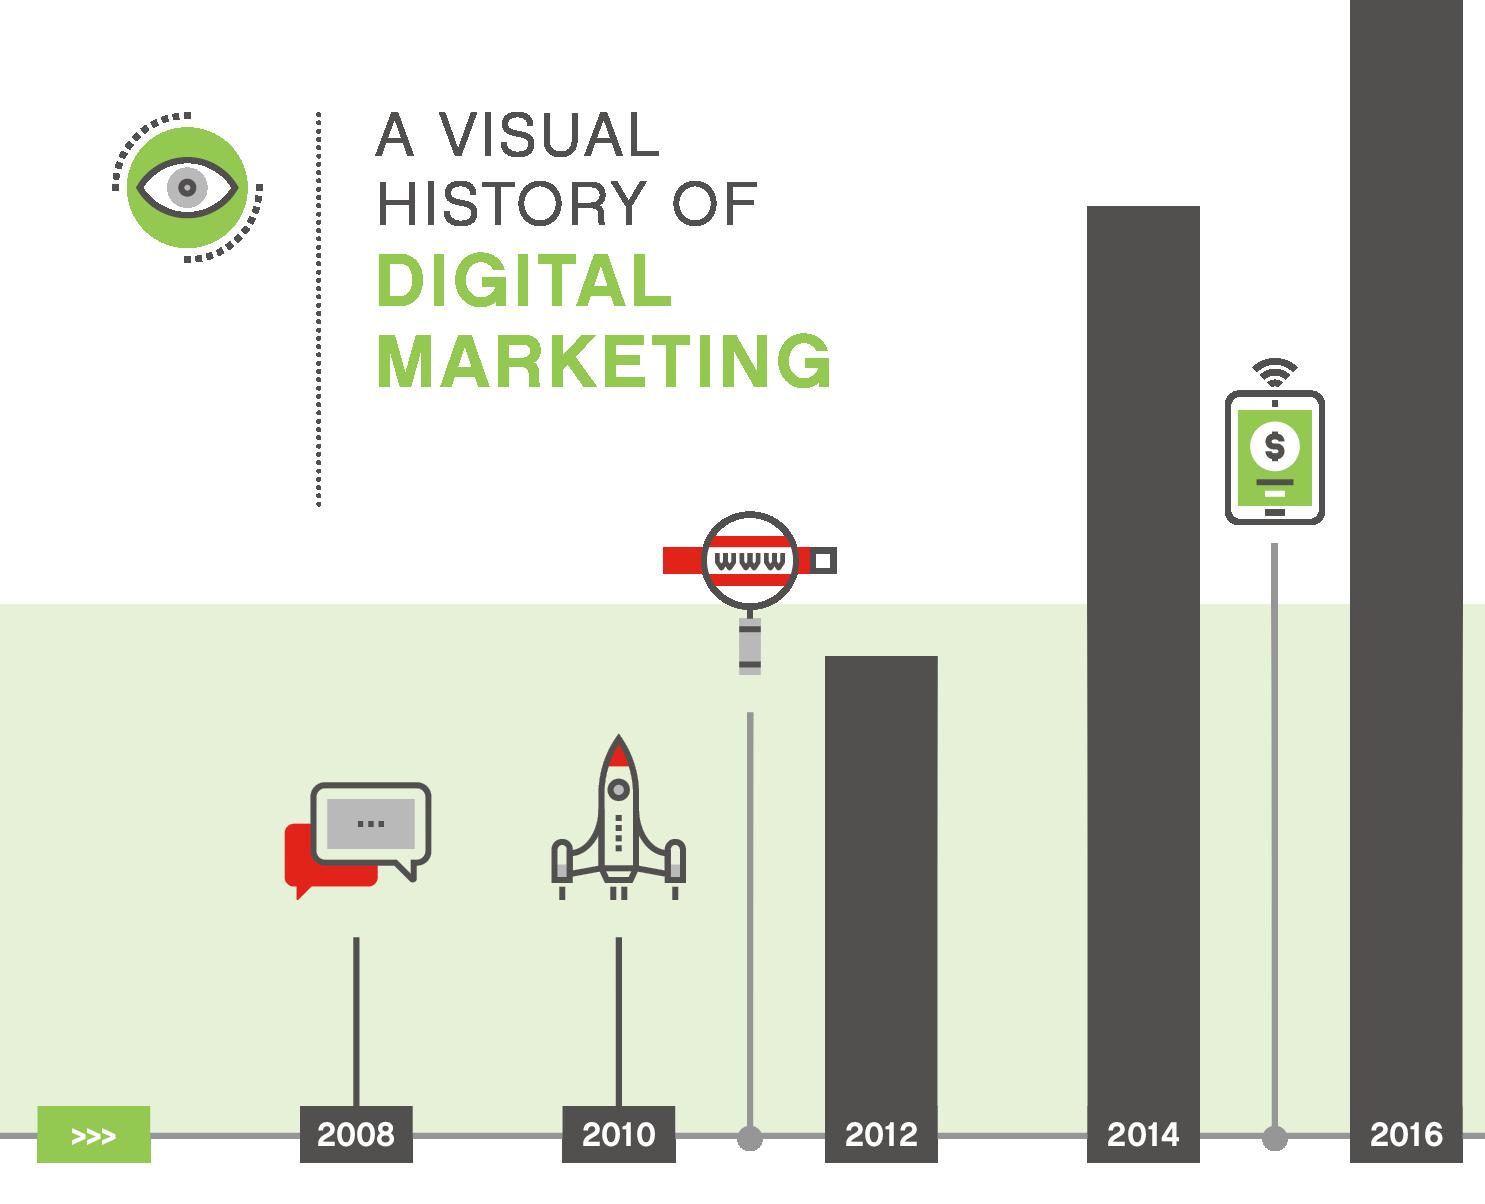 A Visual History of Digital Marketing